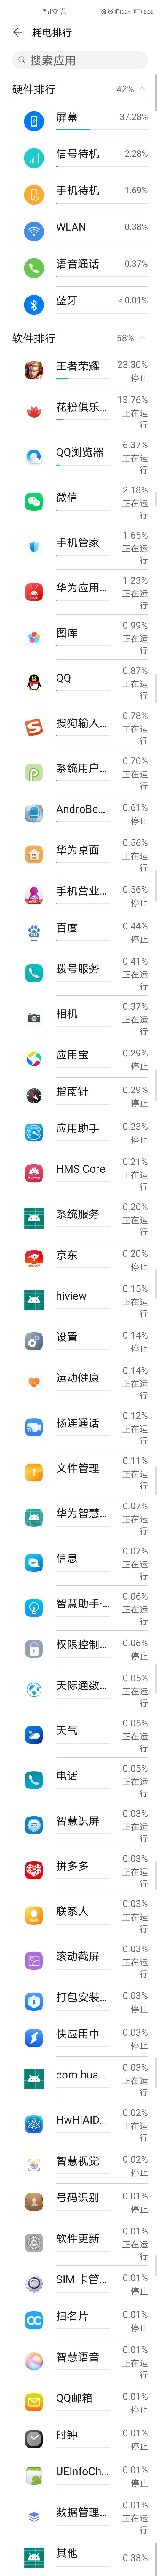 Screenshot_20200508_053846_com.huawei.systemmanager.jpg